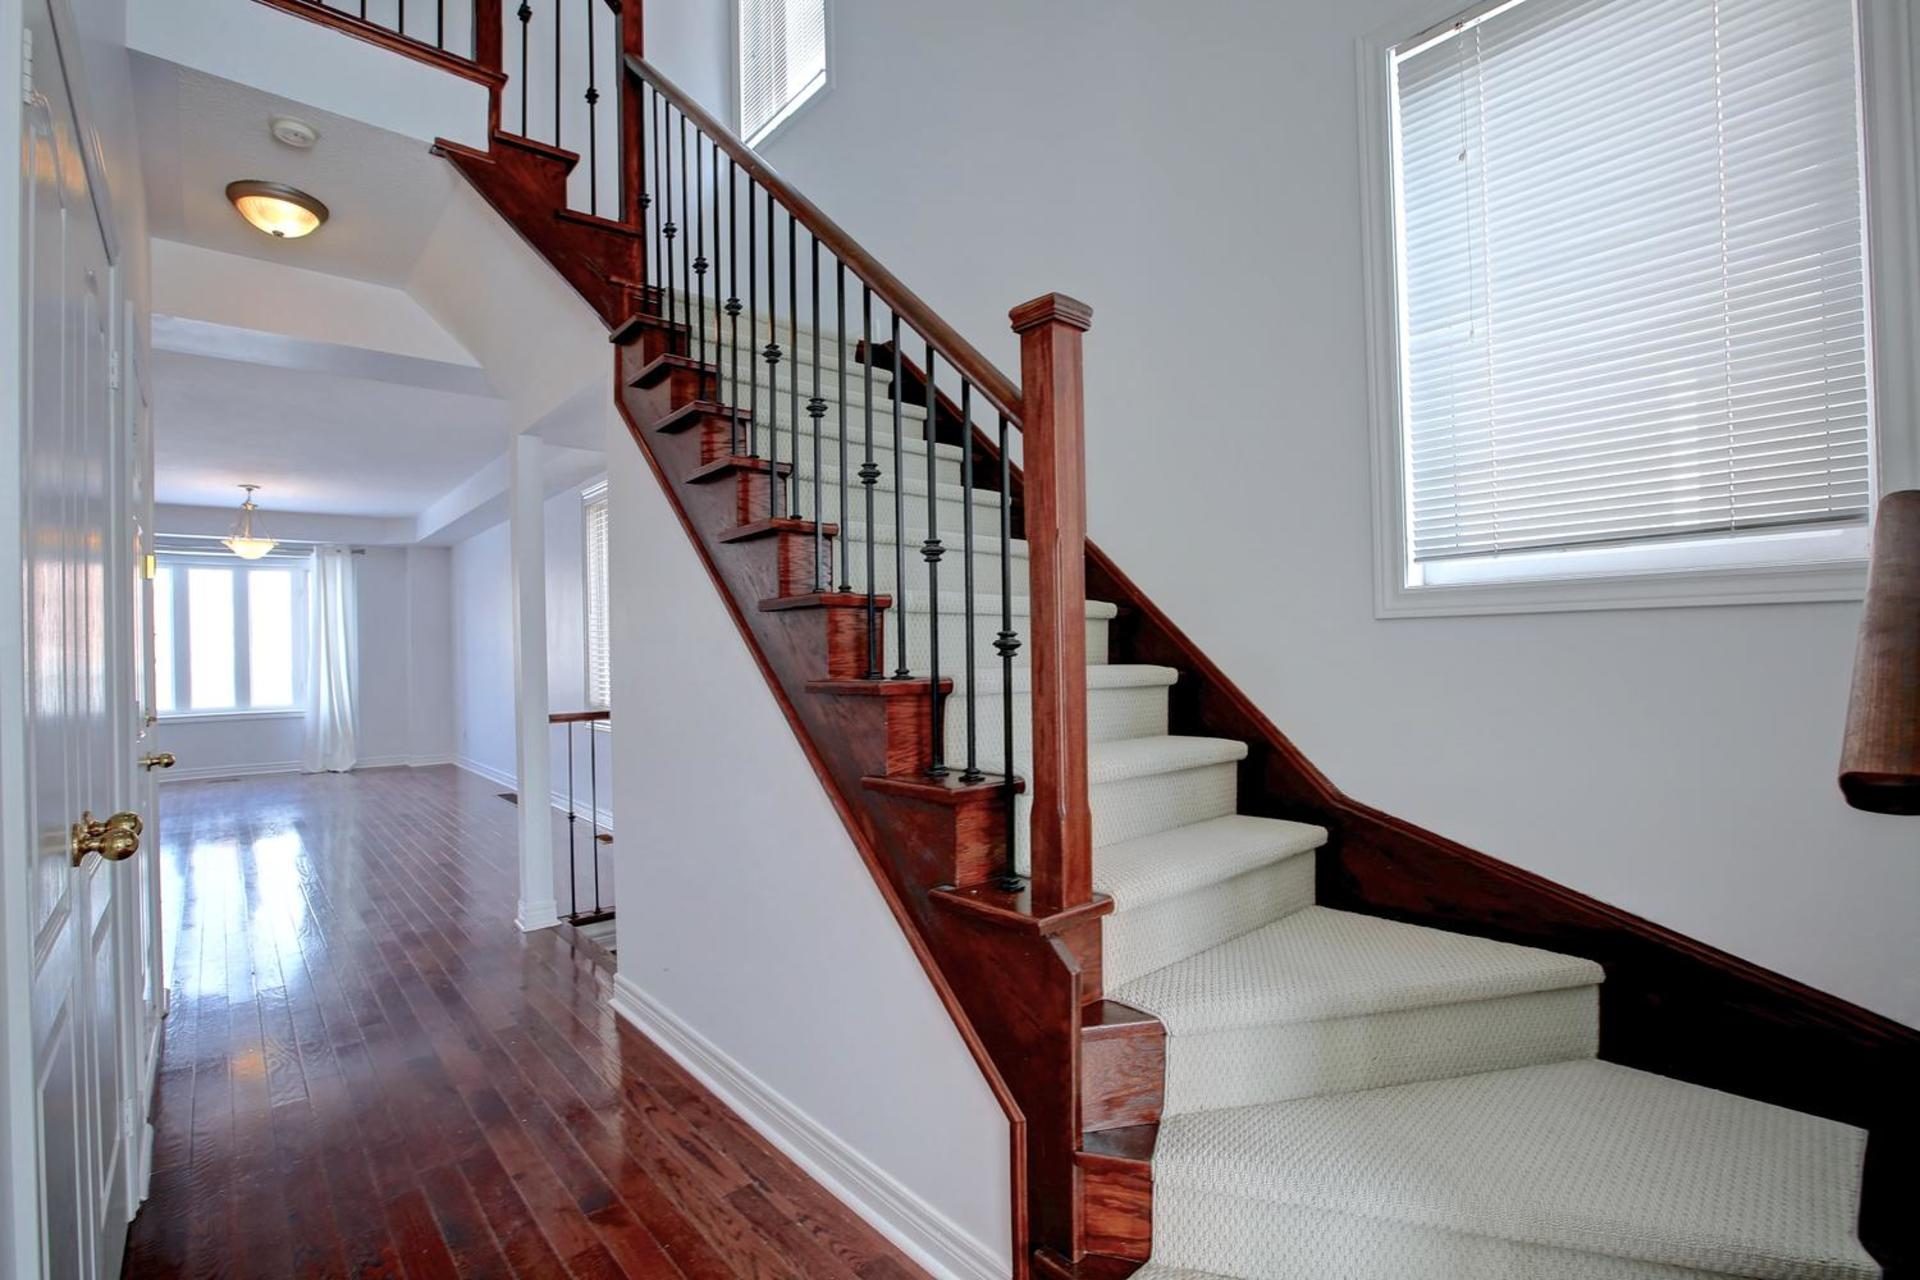 3422-fox-run-cir-staircase at 1809 - 5250 Lakeshore Road, Appleby, Burlington